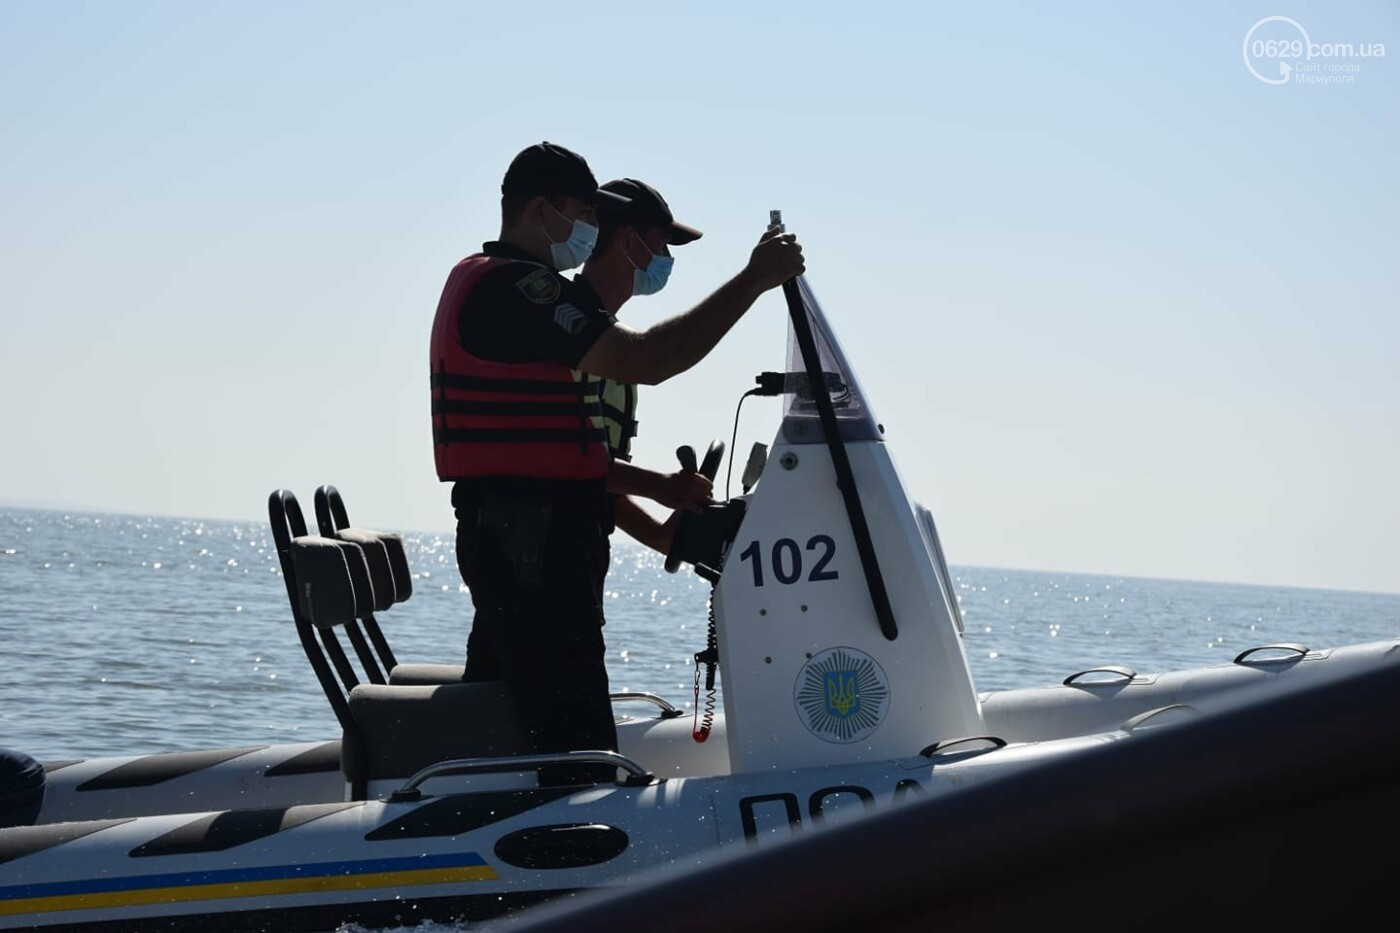 Безопасное море. Акваторию Мариуполя патрулируют силовики, - ВИДЕО, ФОТО, фото-3